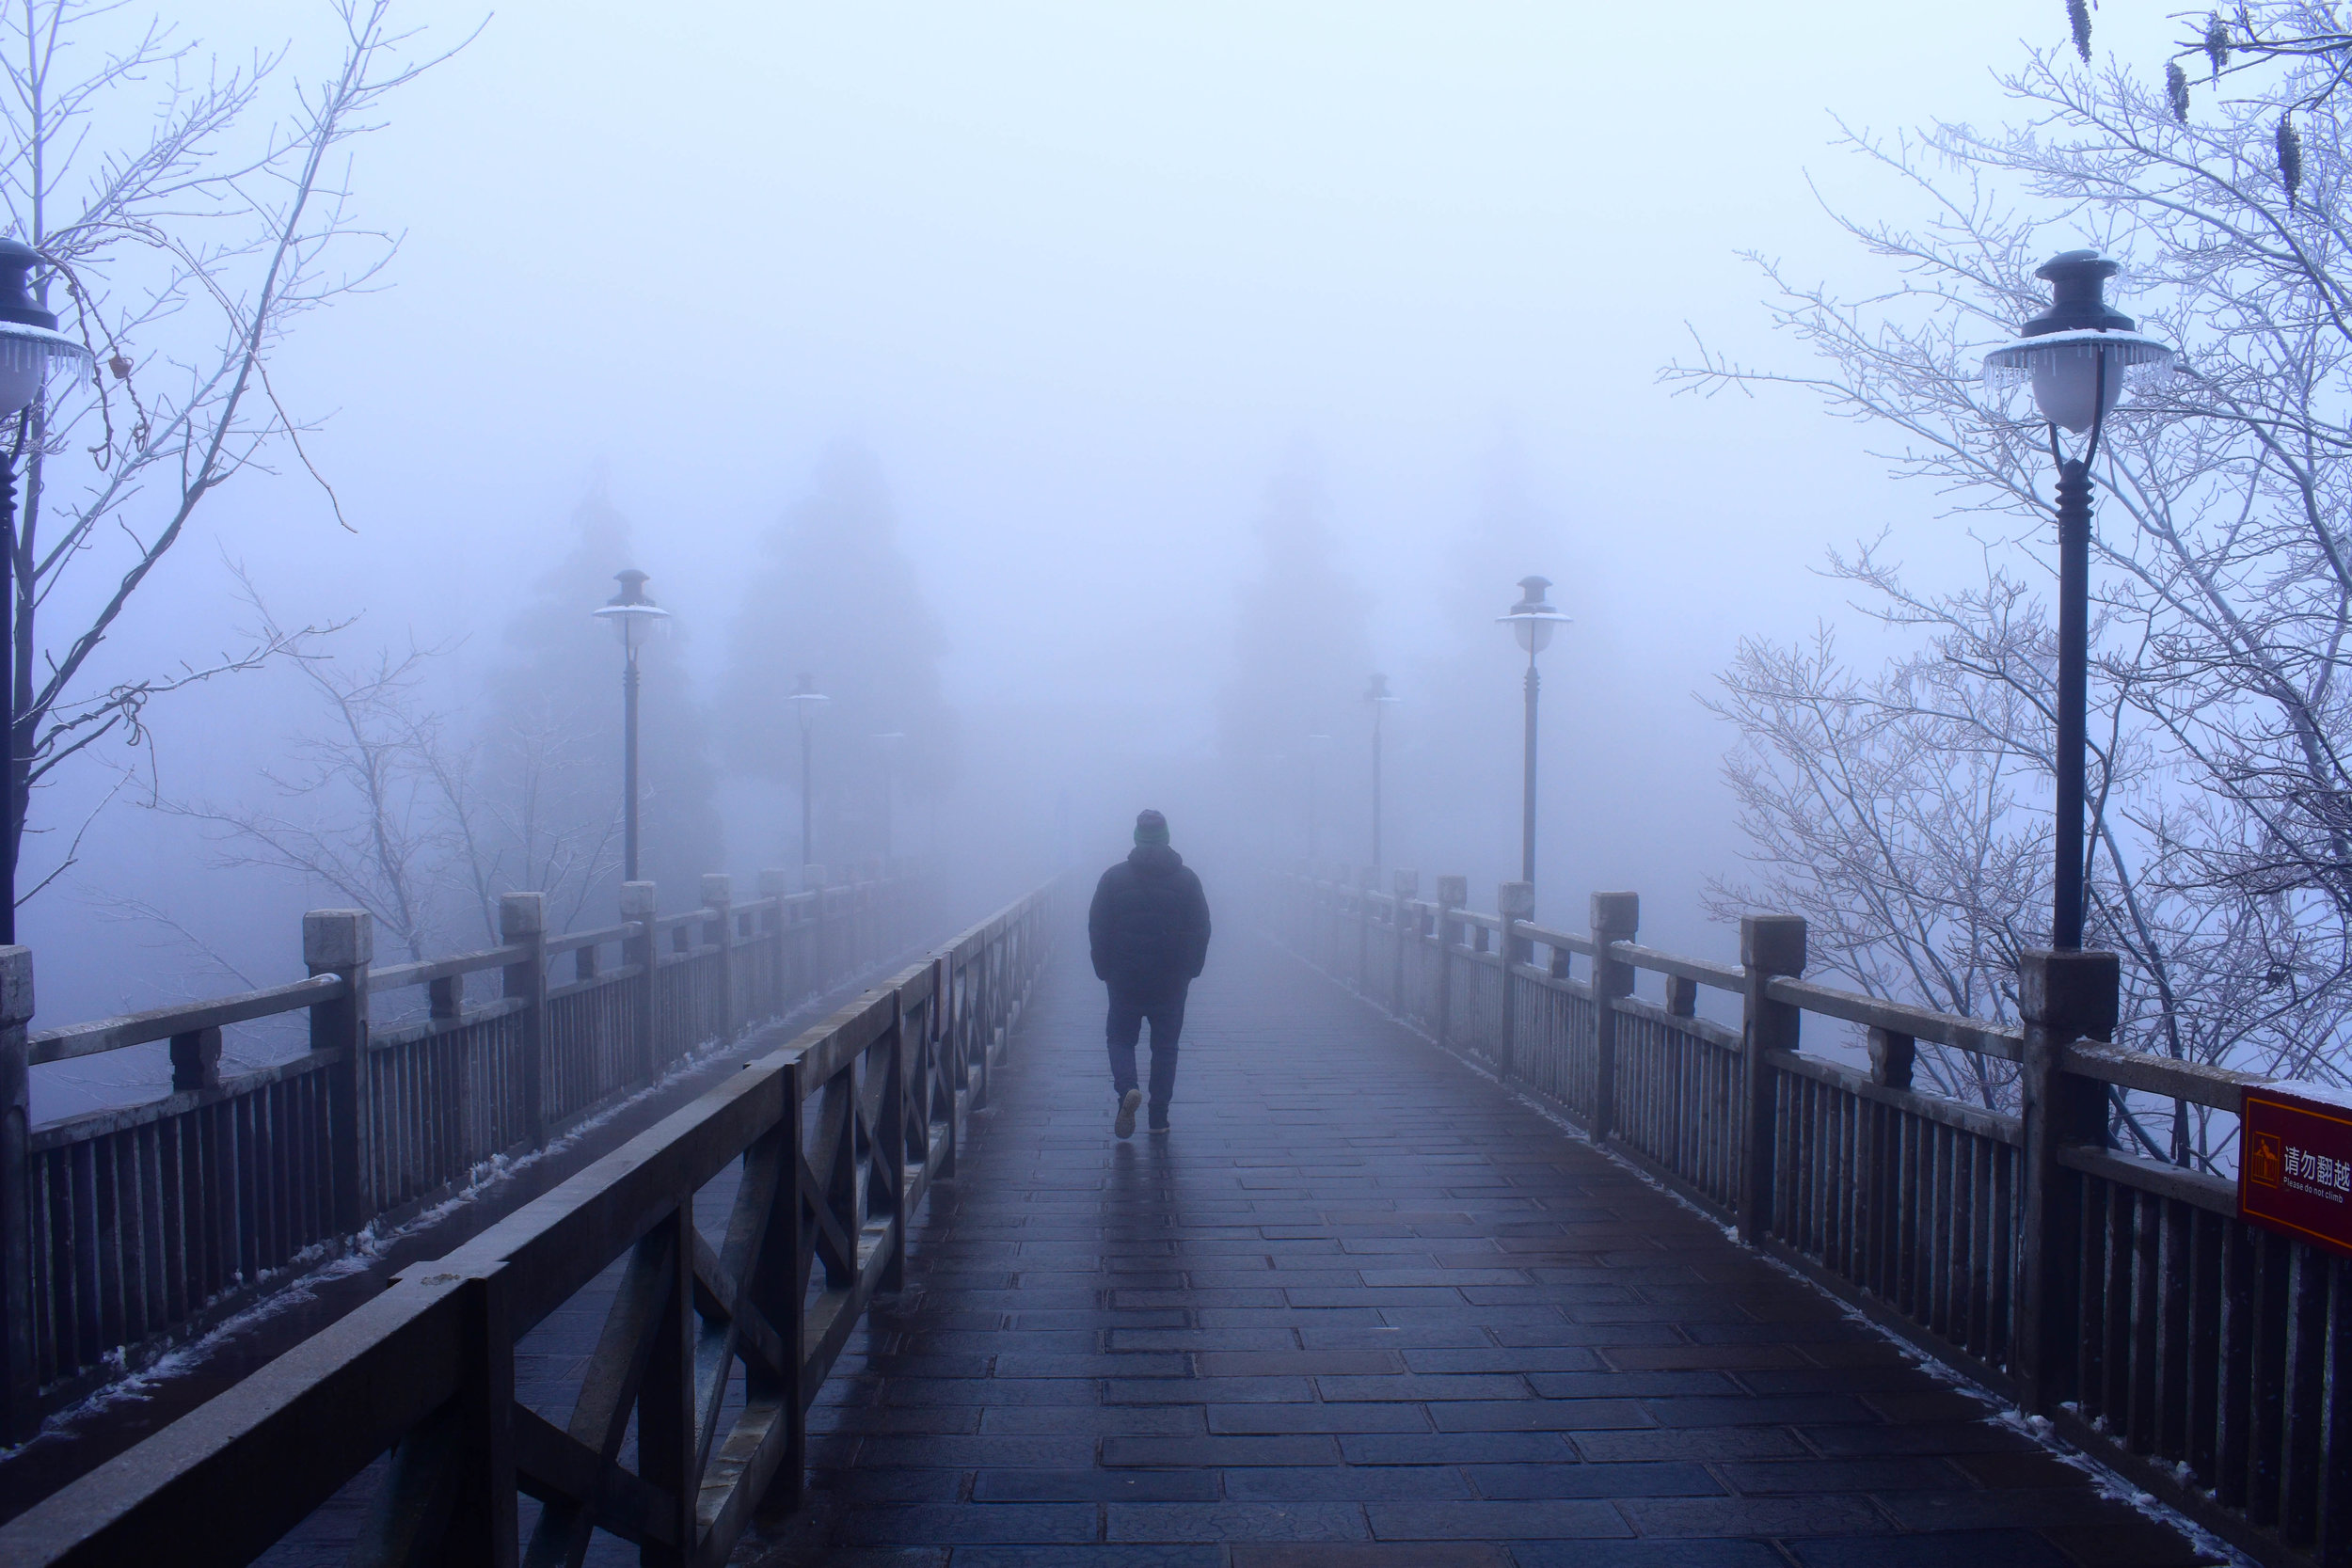 Zhangjiajie Through the Mist